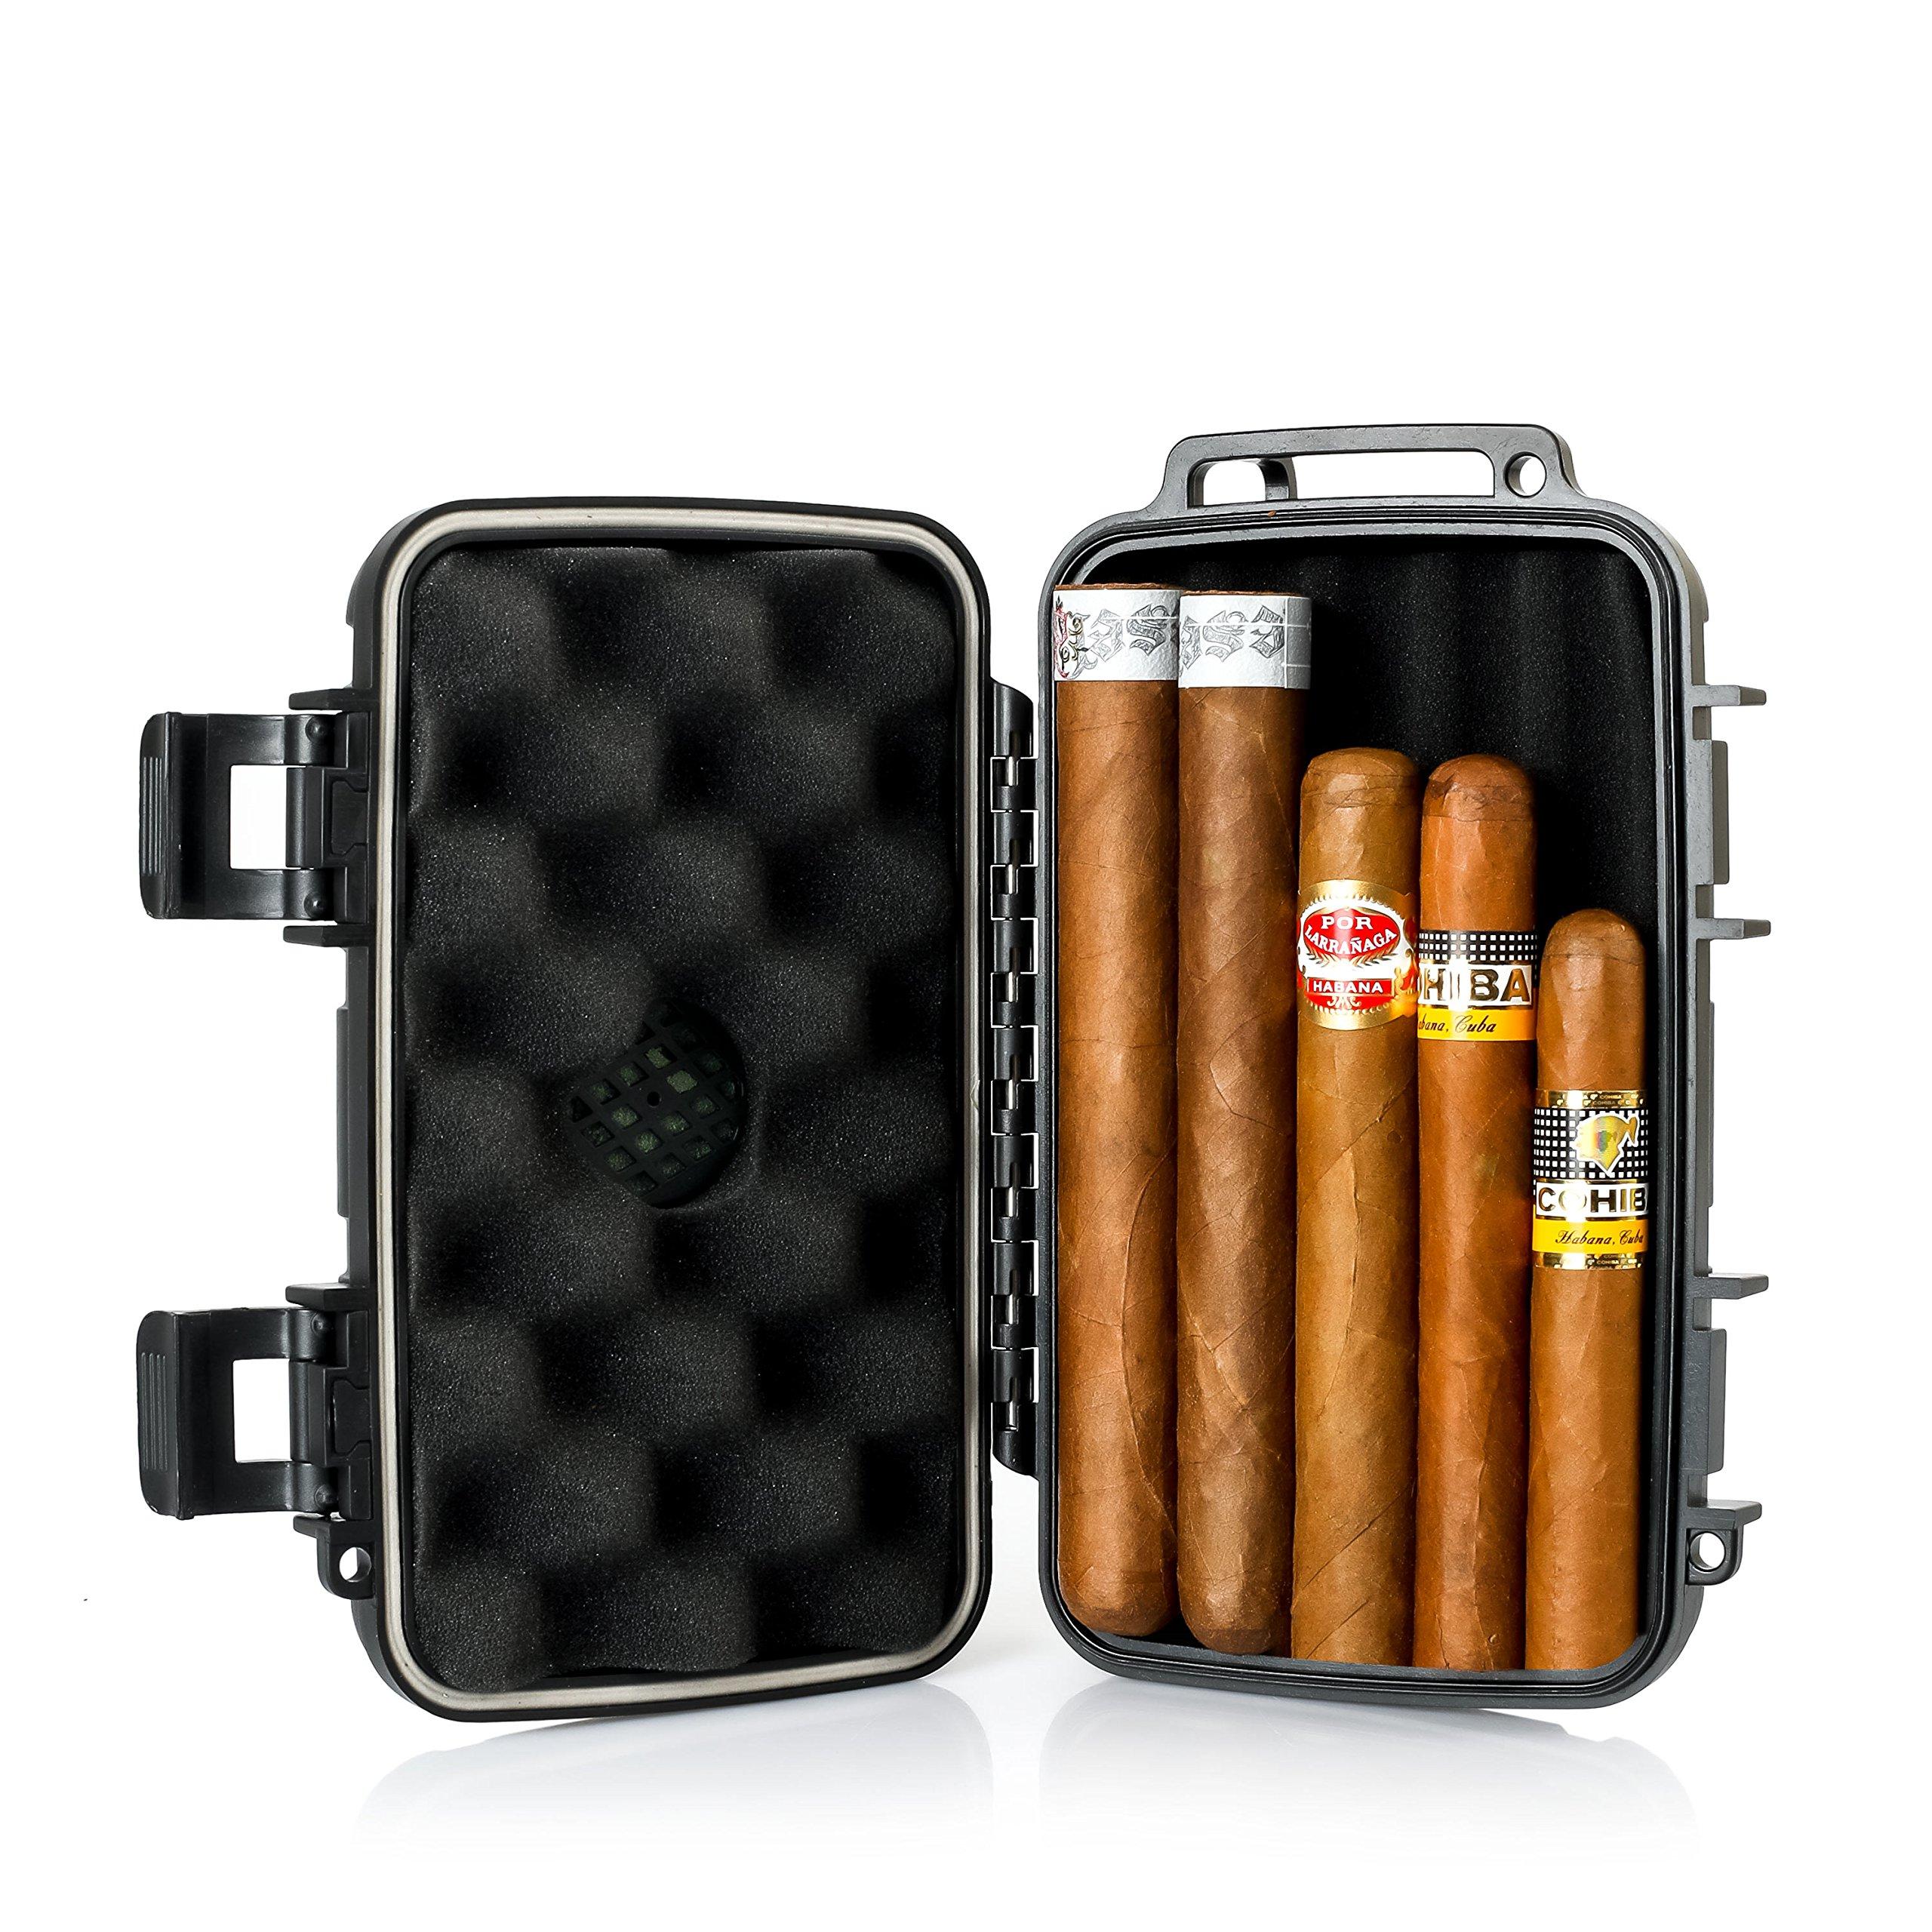 Jamestown Cigar Trail Ridge Plastic Travel Humidor Cigar Case - Rugged, Waterproof, Dustproof, Shockproof Premium Plastic Hard Shell Case - Built in Foam Humidor and Holds up to 5 Cigars (Original)